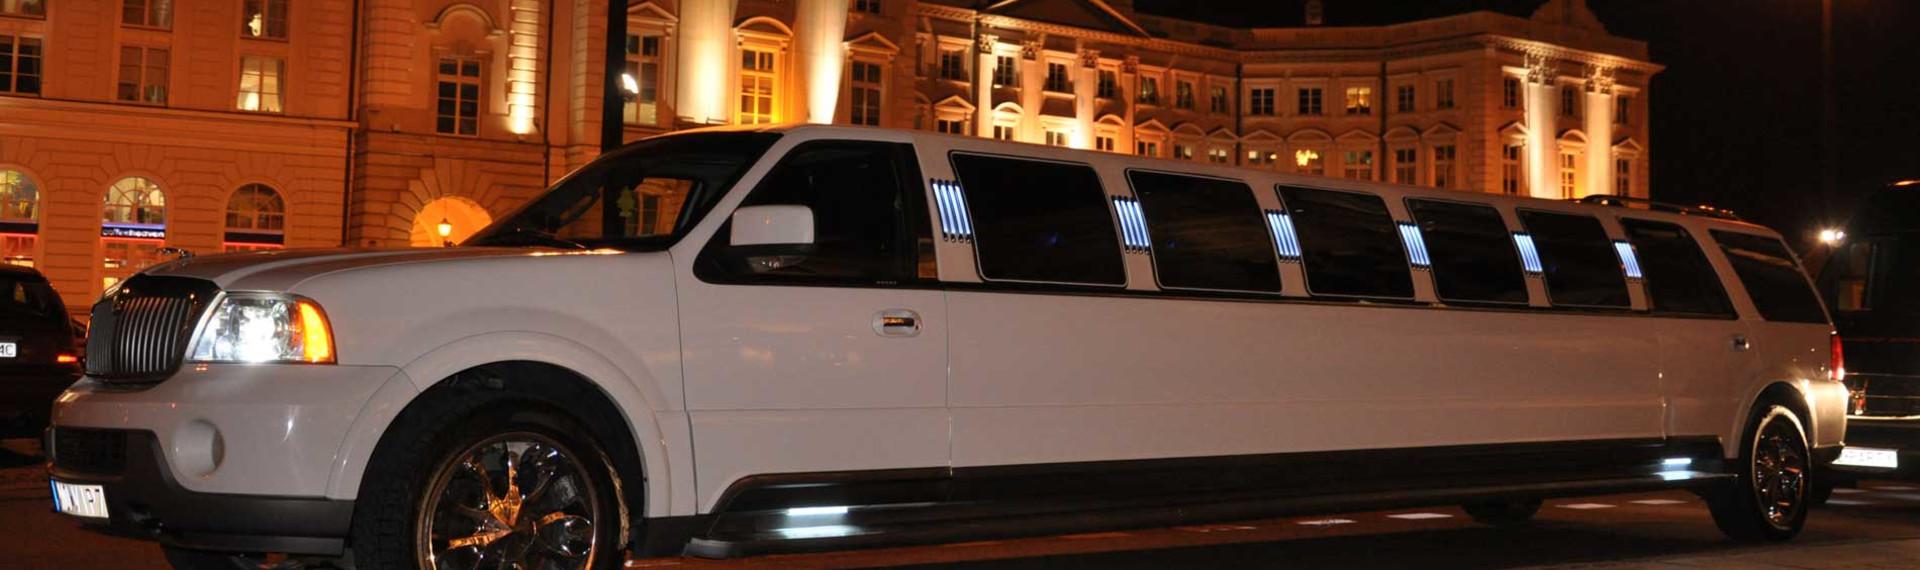 Barcelone Trajet en limousine Lincoln image